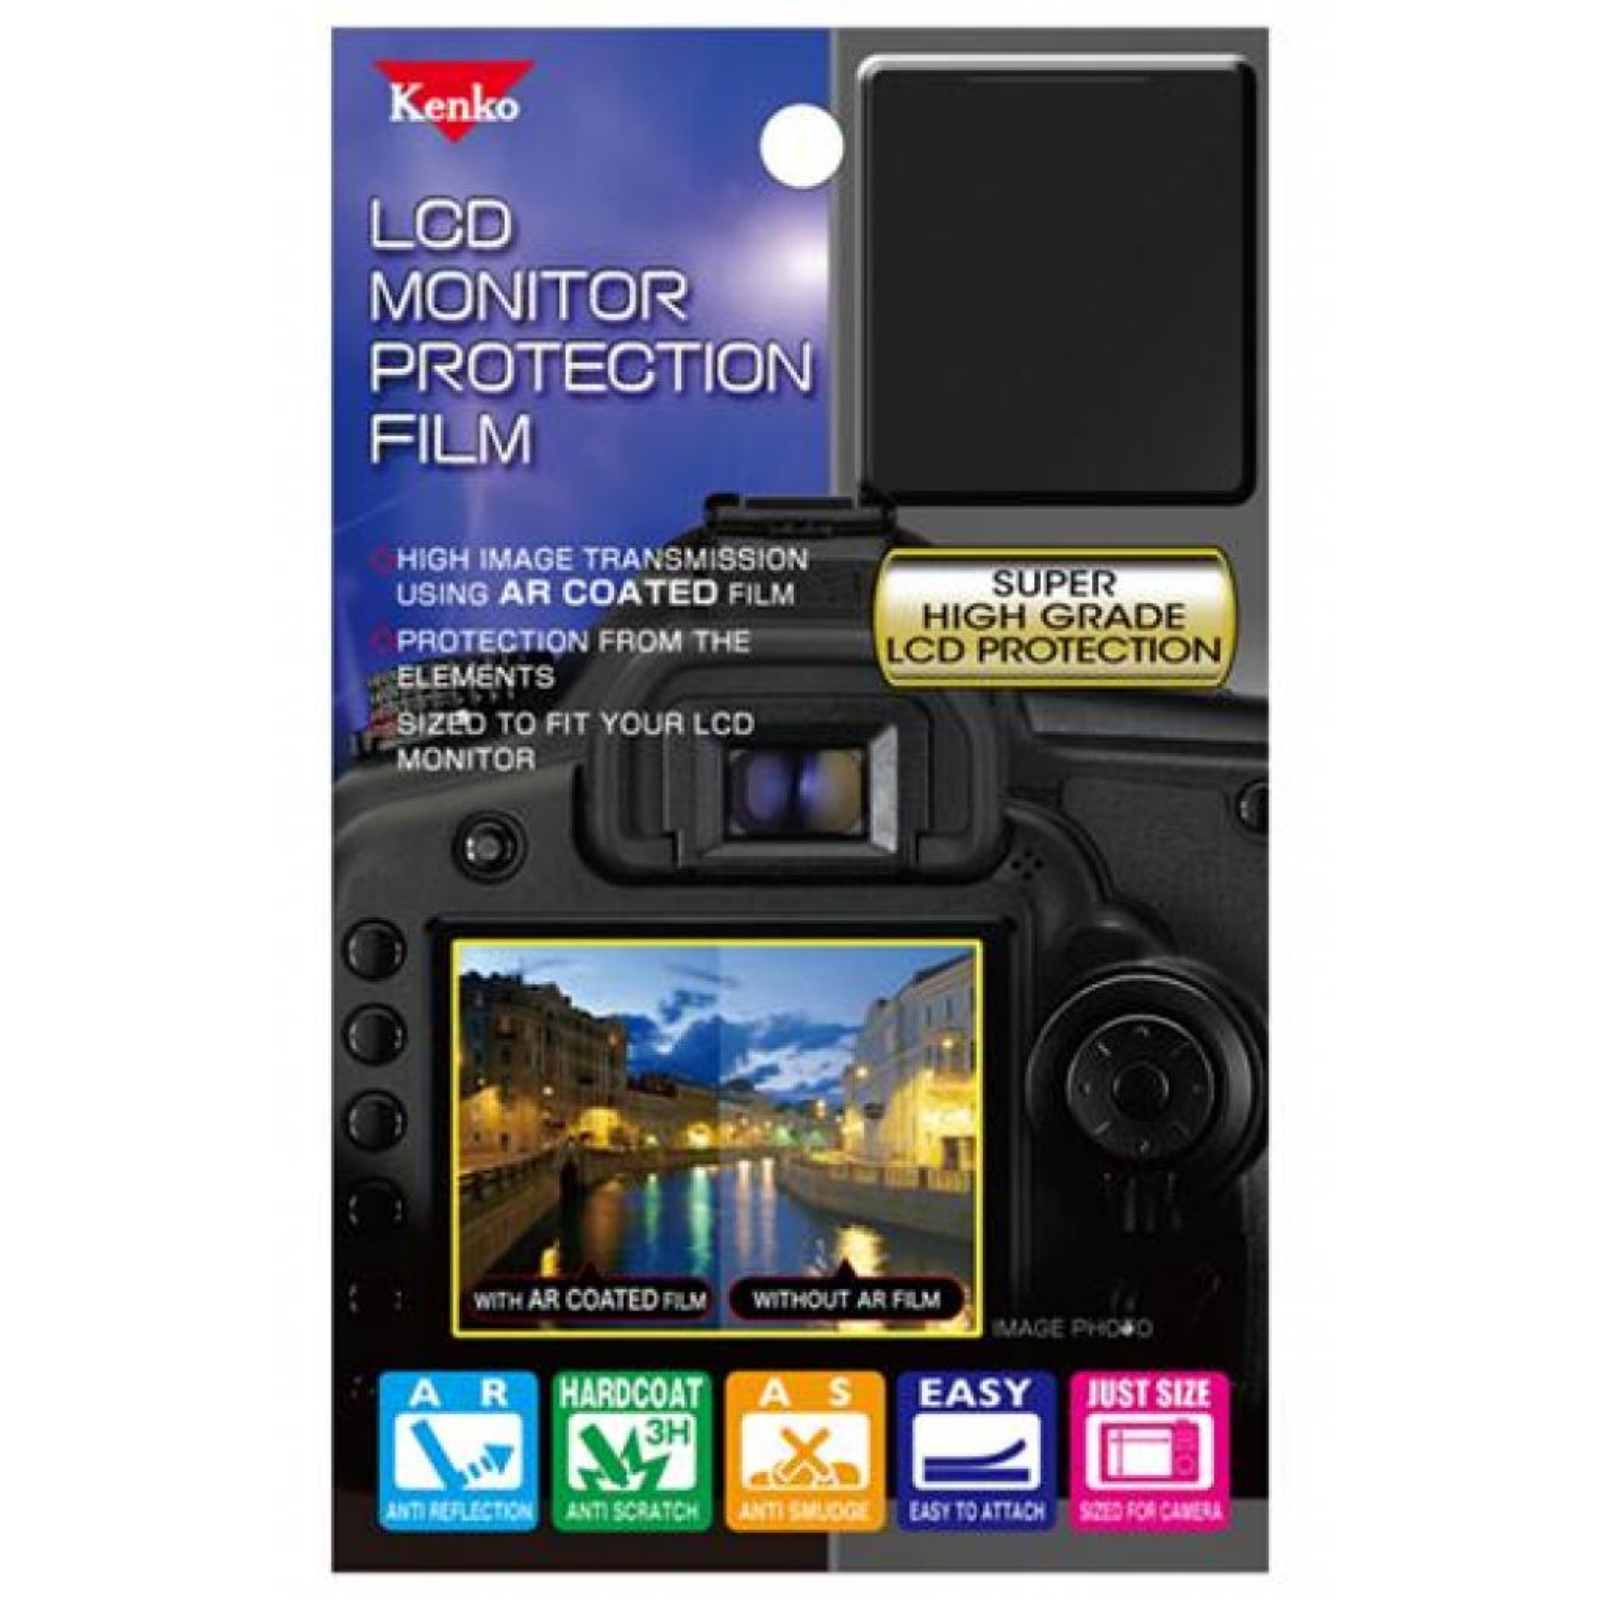 "Пленка защитная Kenko LCD protect film 3"" (085092)"